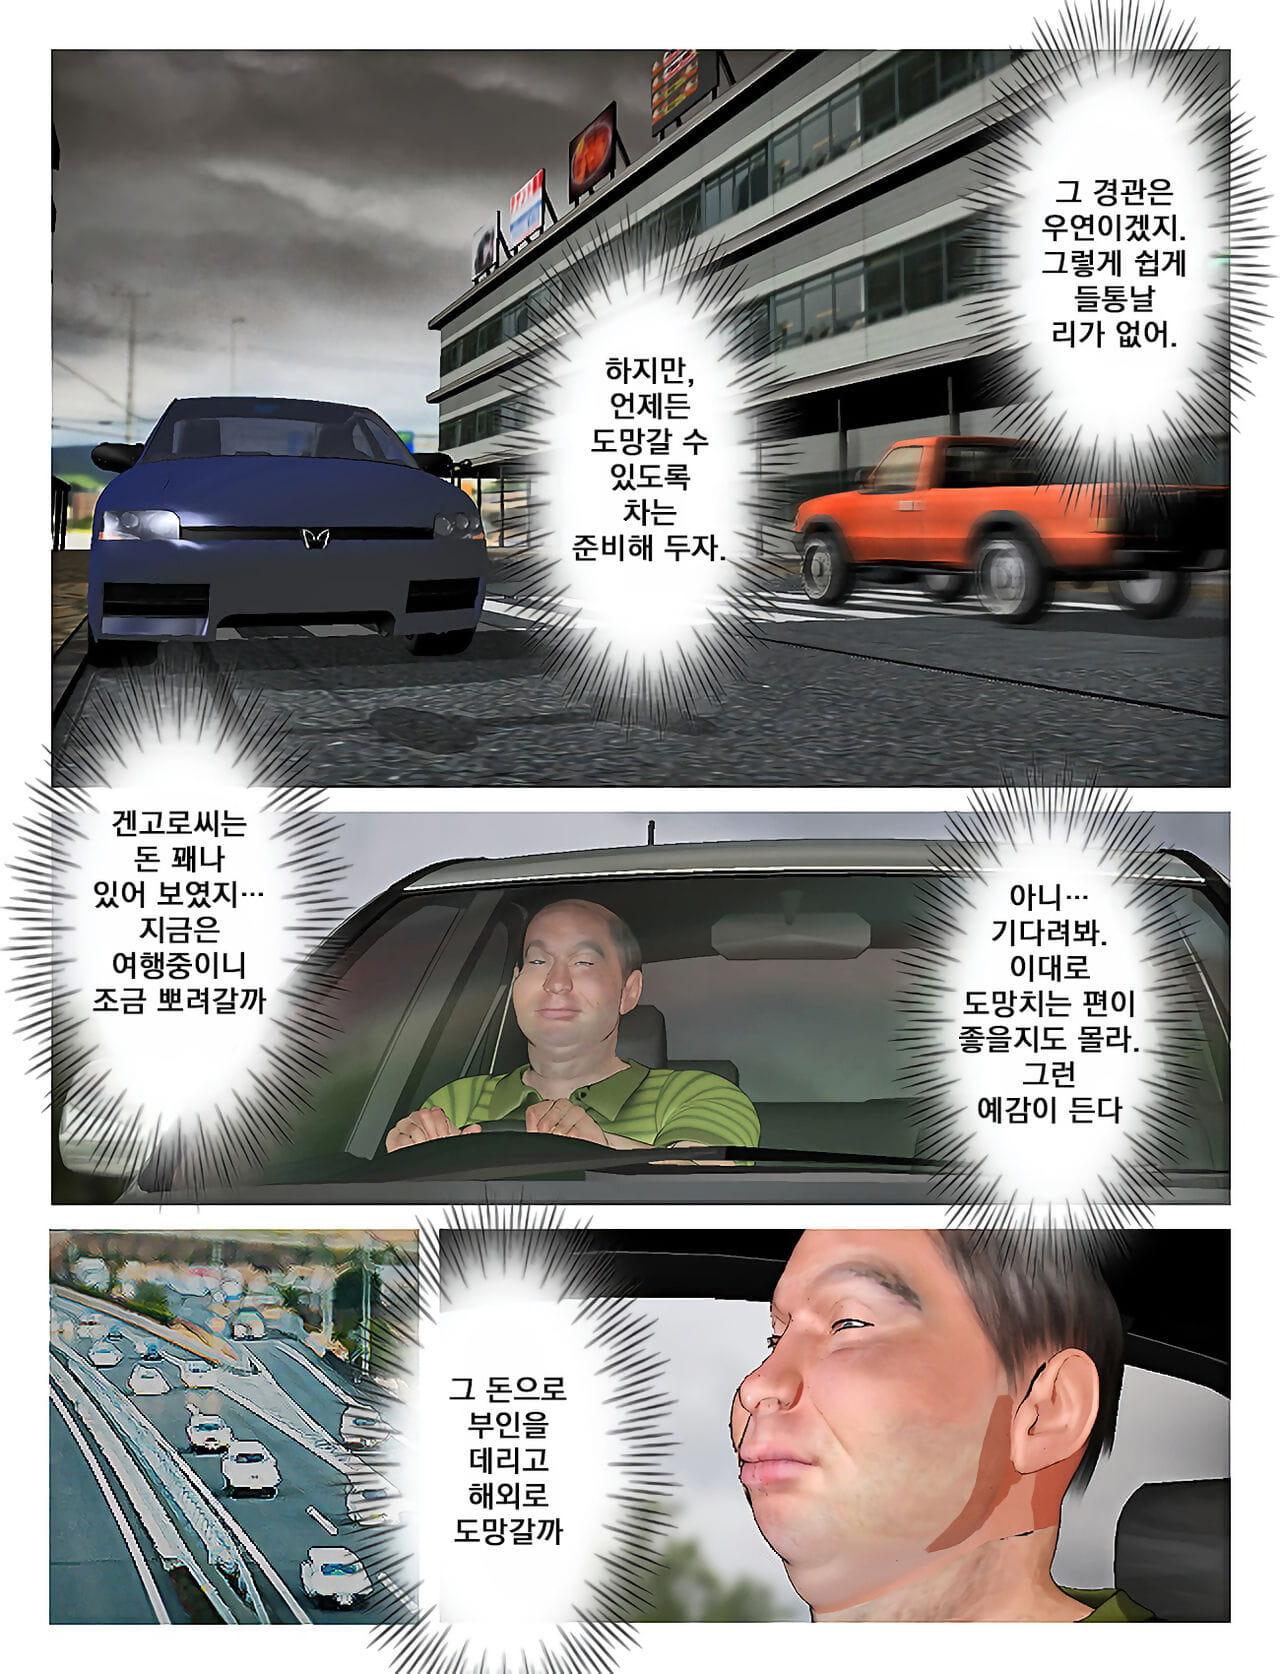 Snare get under one\'s Big wheel Kyou picayune Misako-san 2019:4 - 오늘의 미사코씨 2019:4 Korean - affixing 3